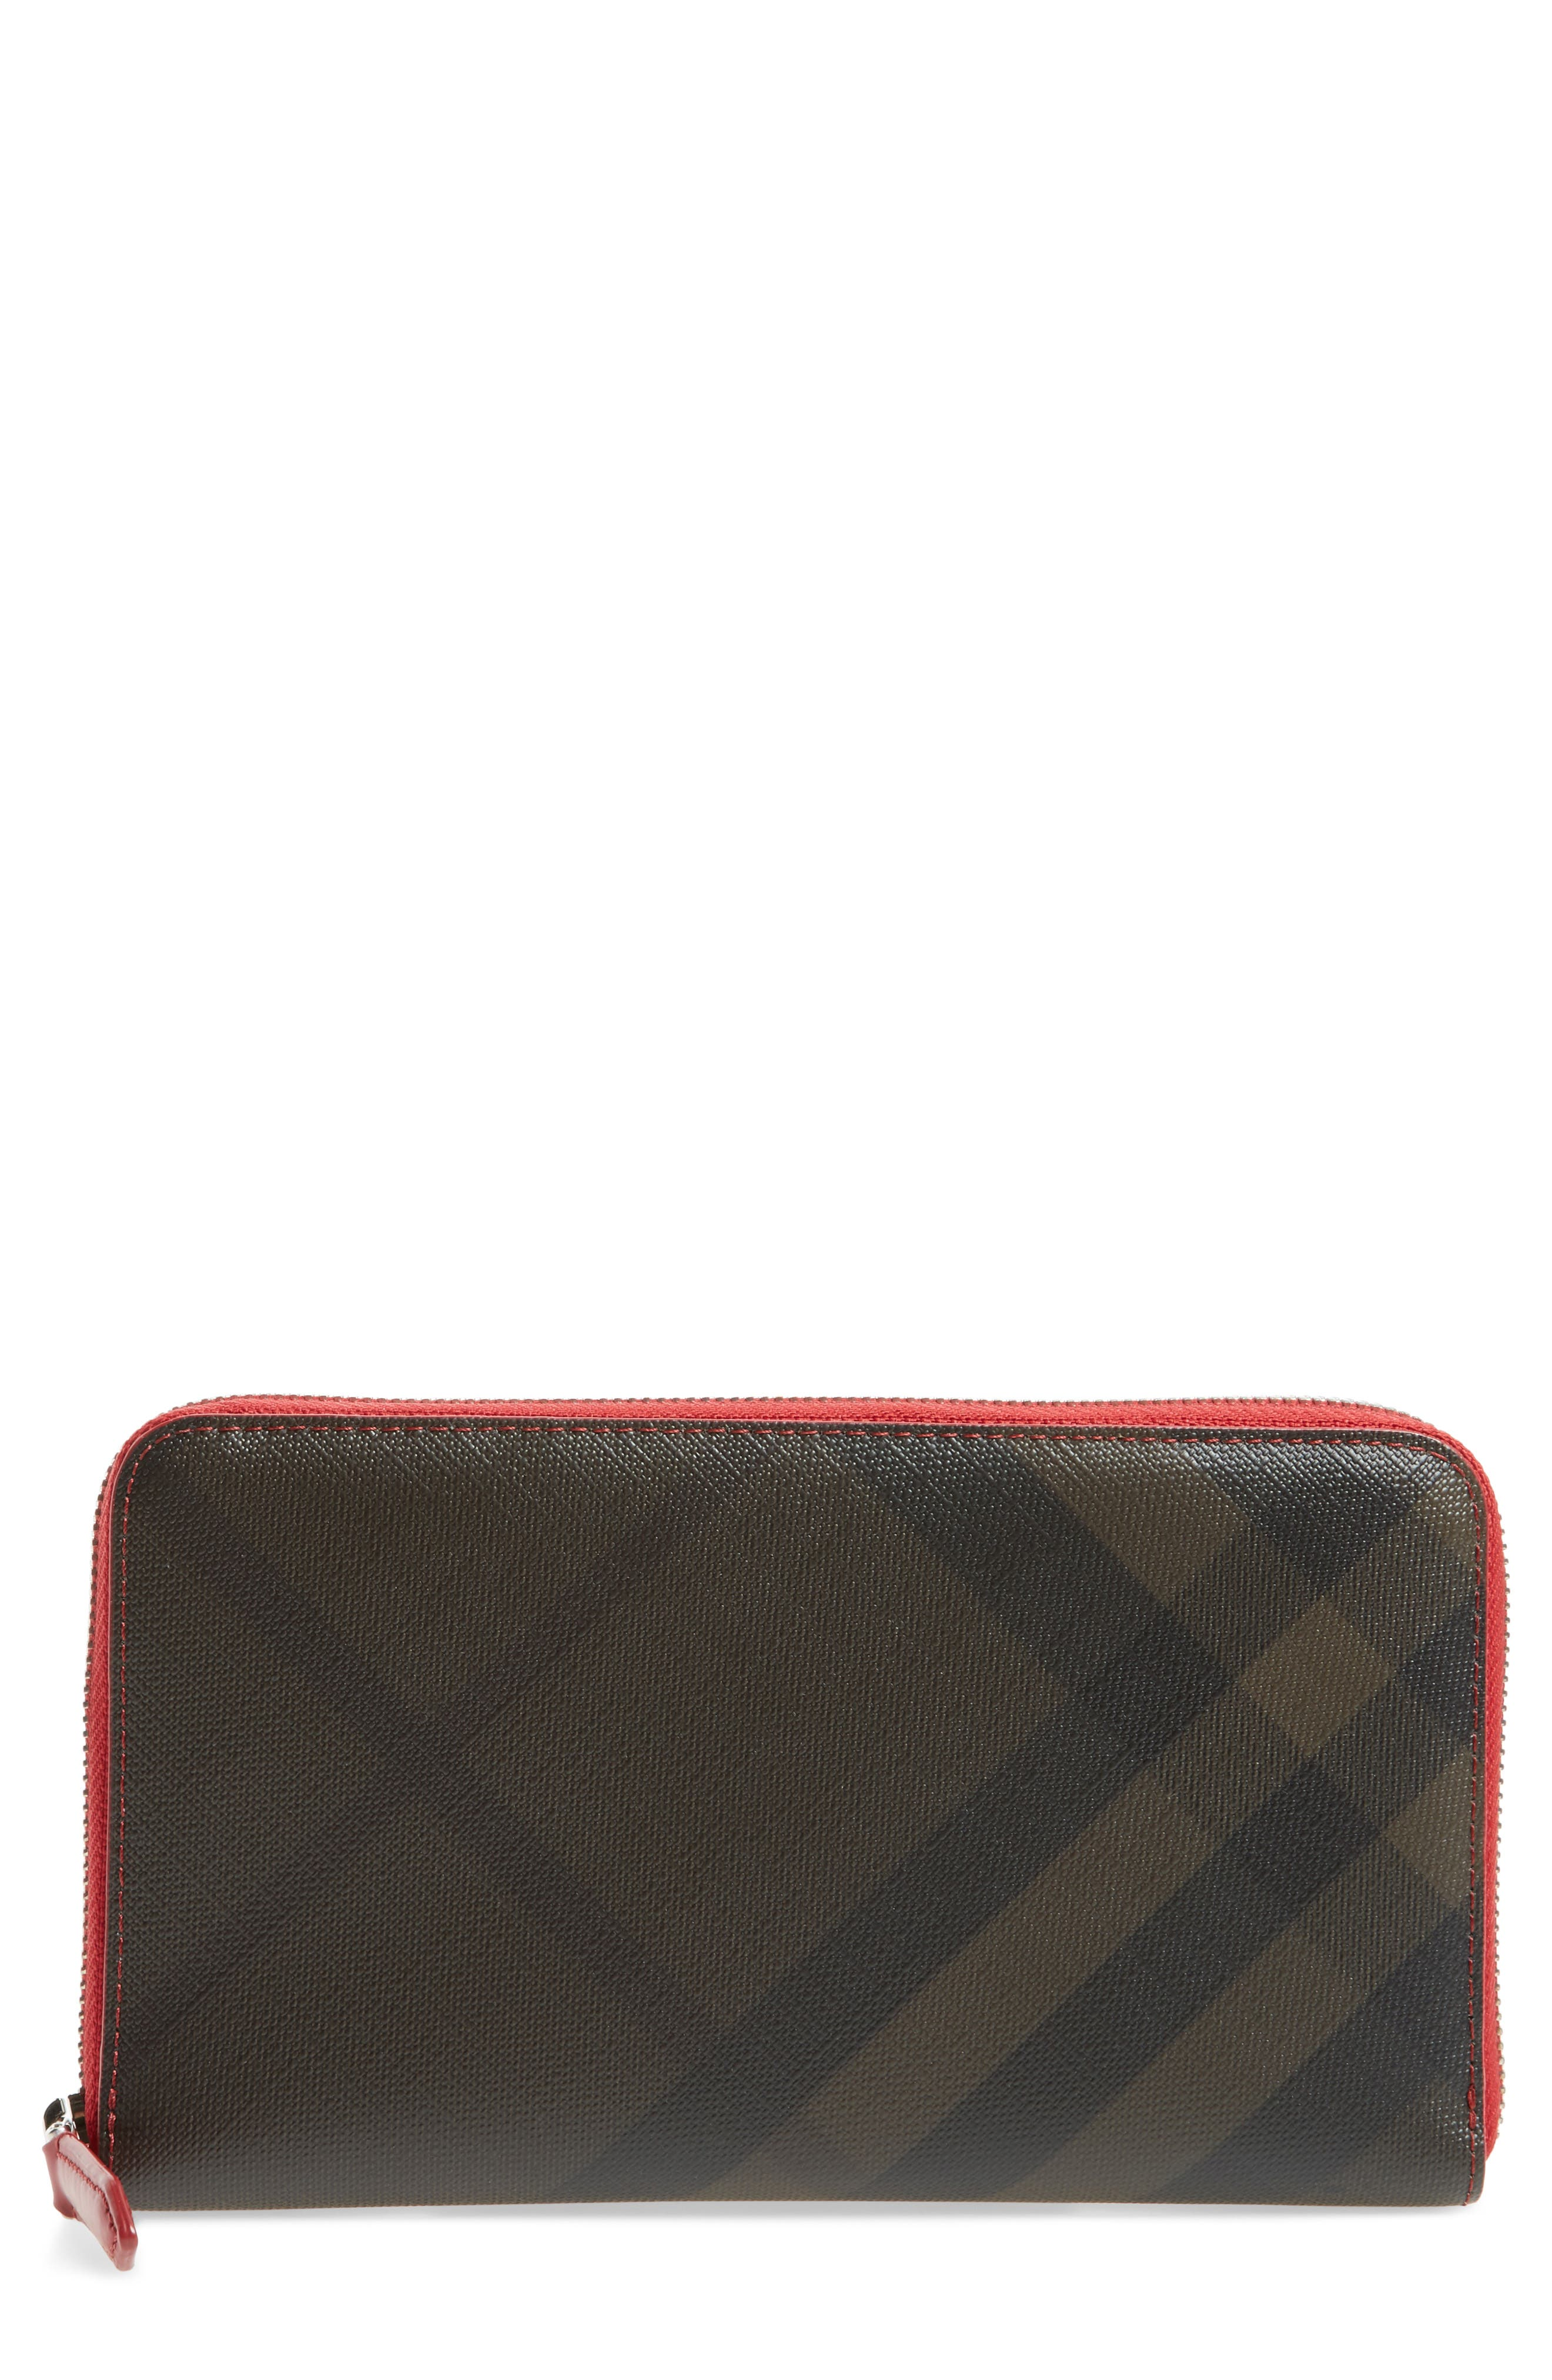 Main Image - Burberry Check Zip Wallet